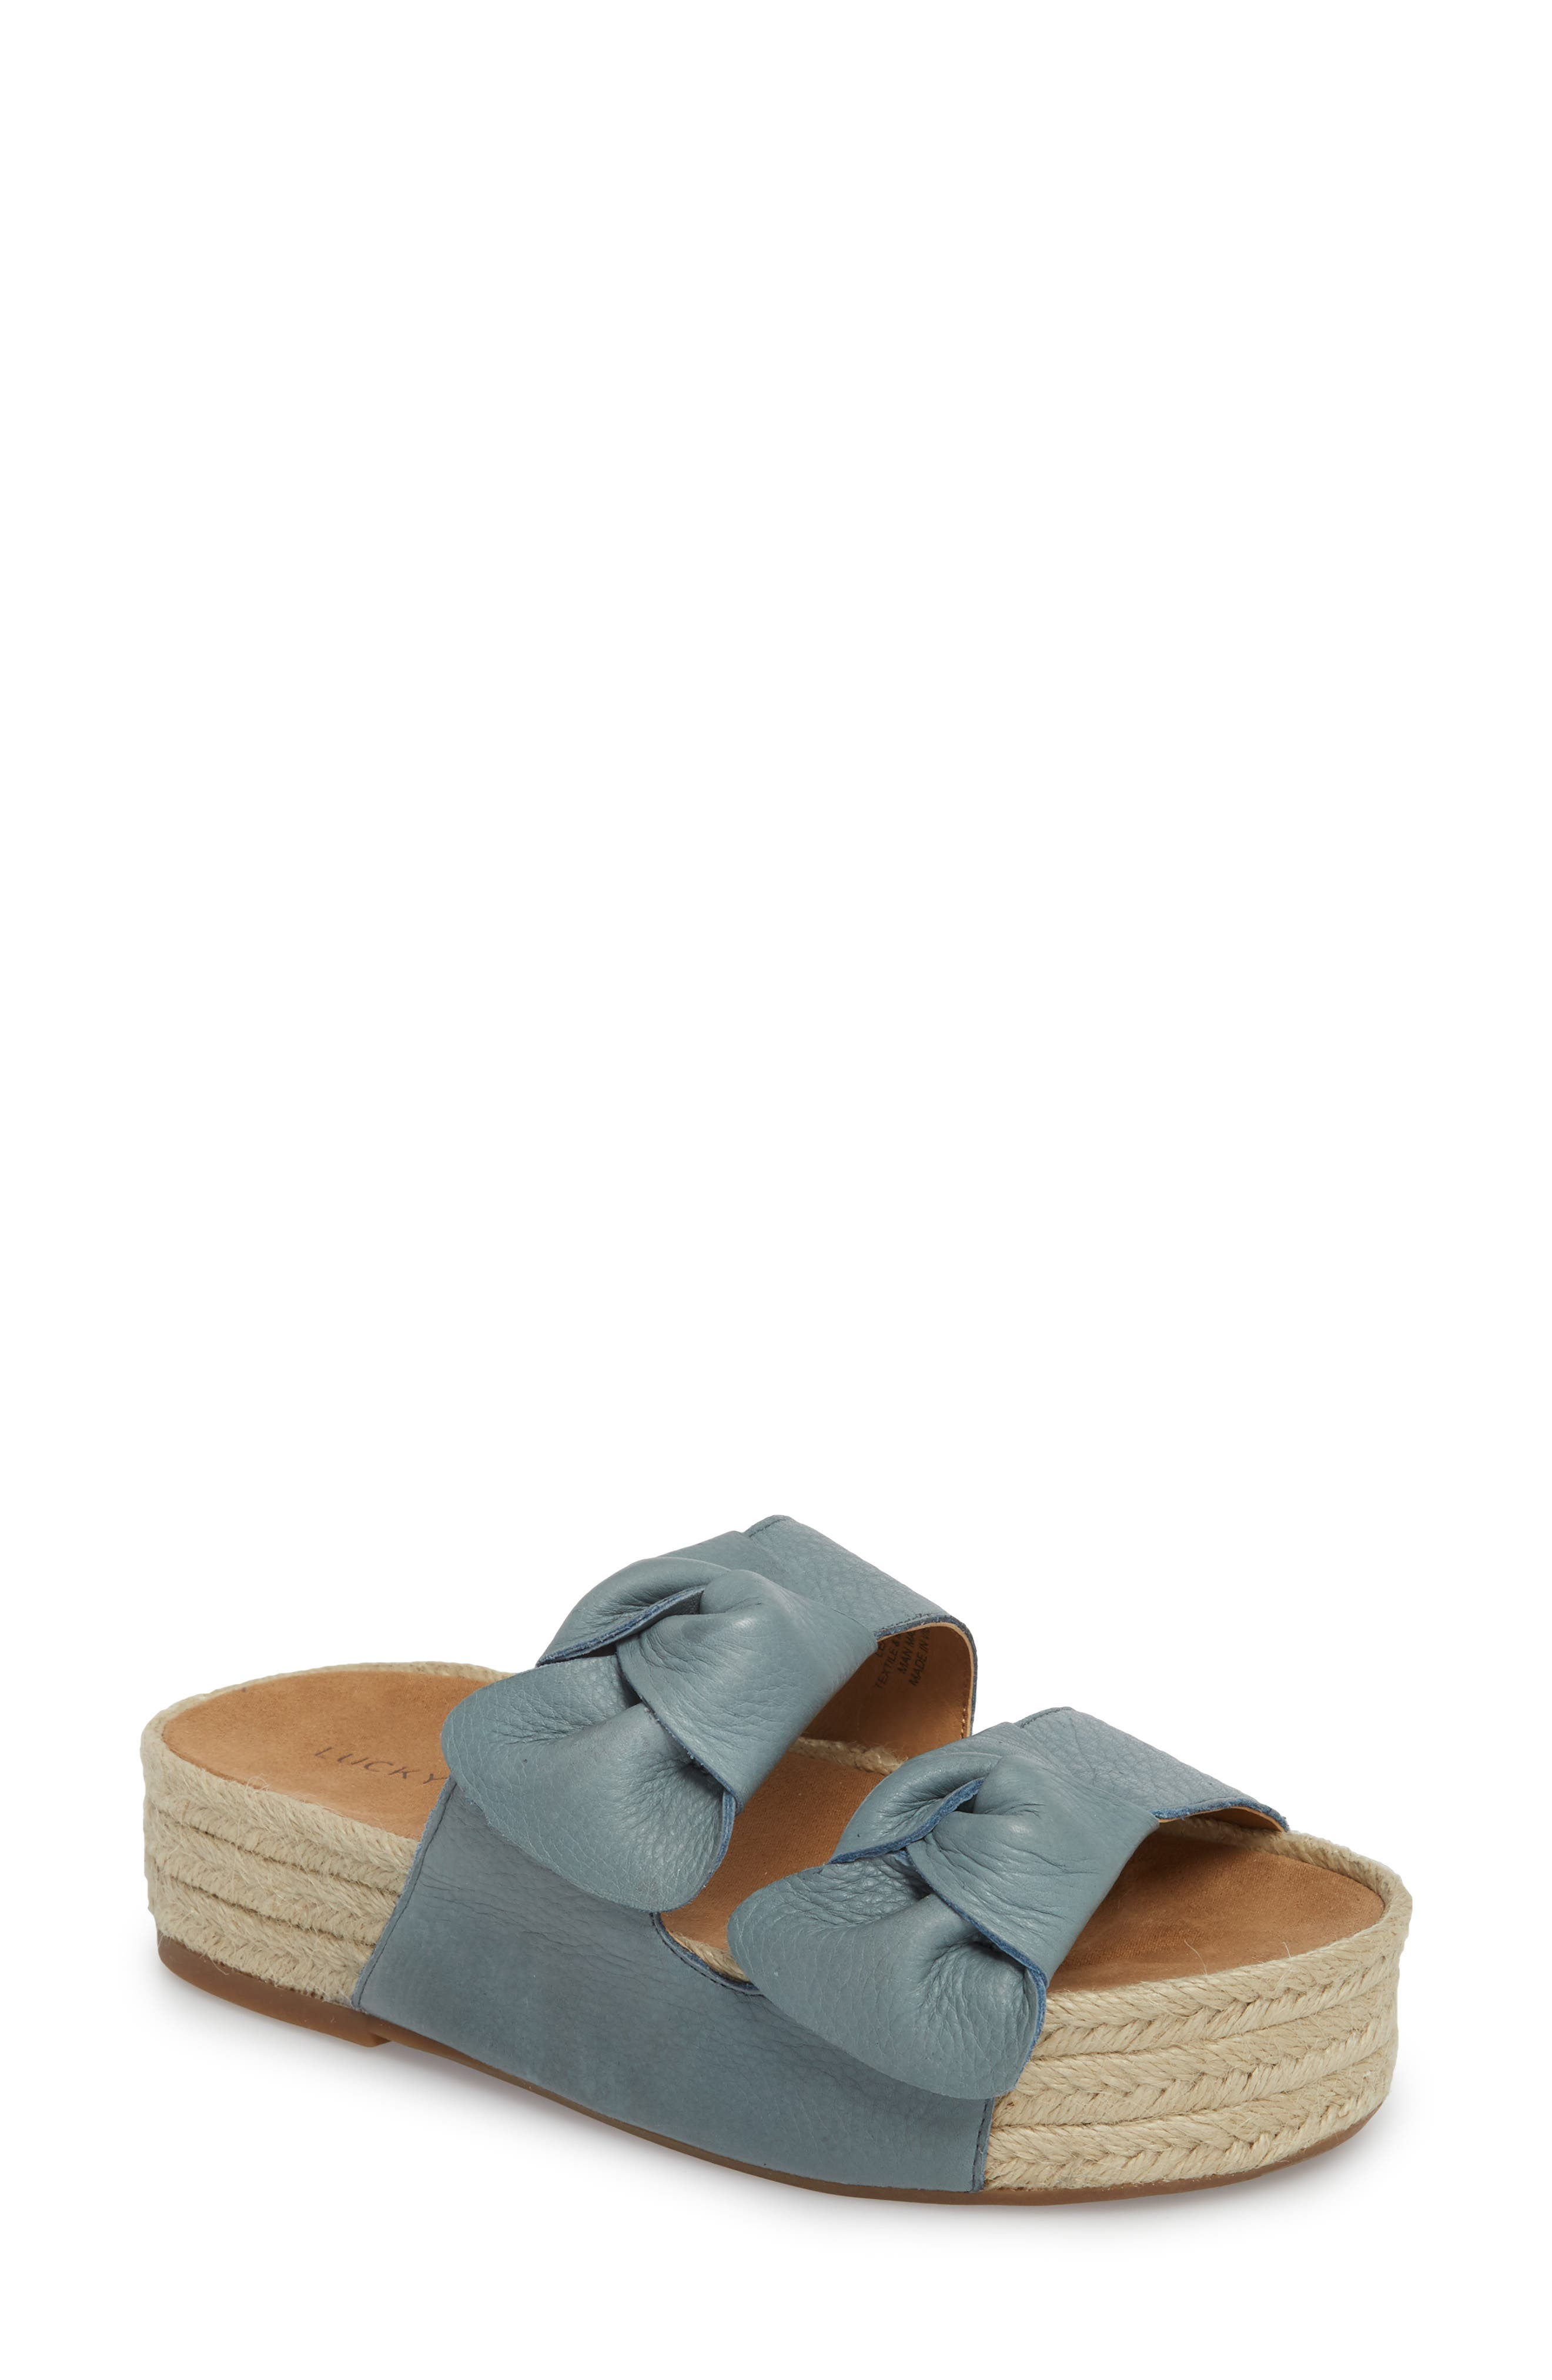 Izbremma Platform Espadrille Sandal,                         Main,                         color, Infinity Leather